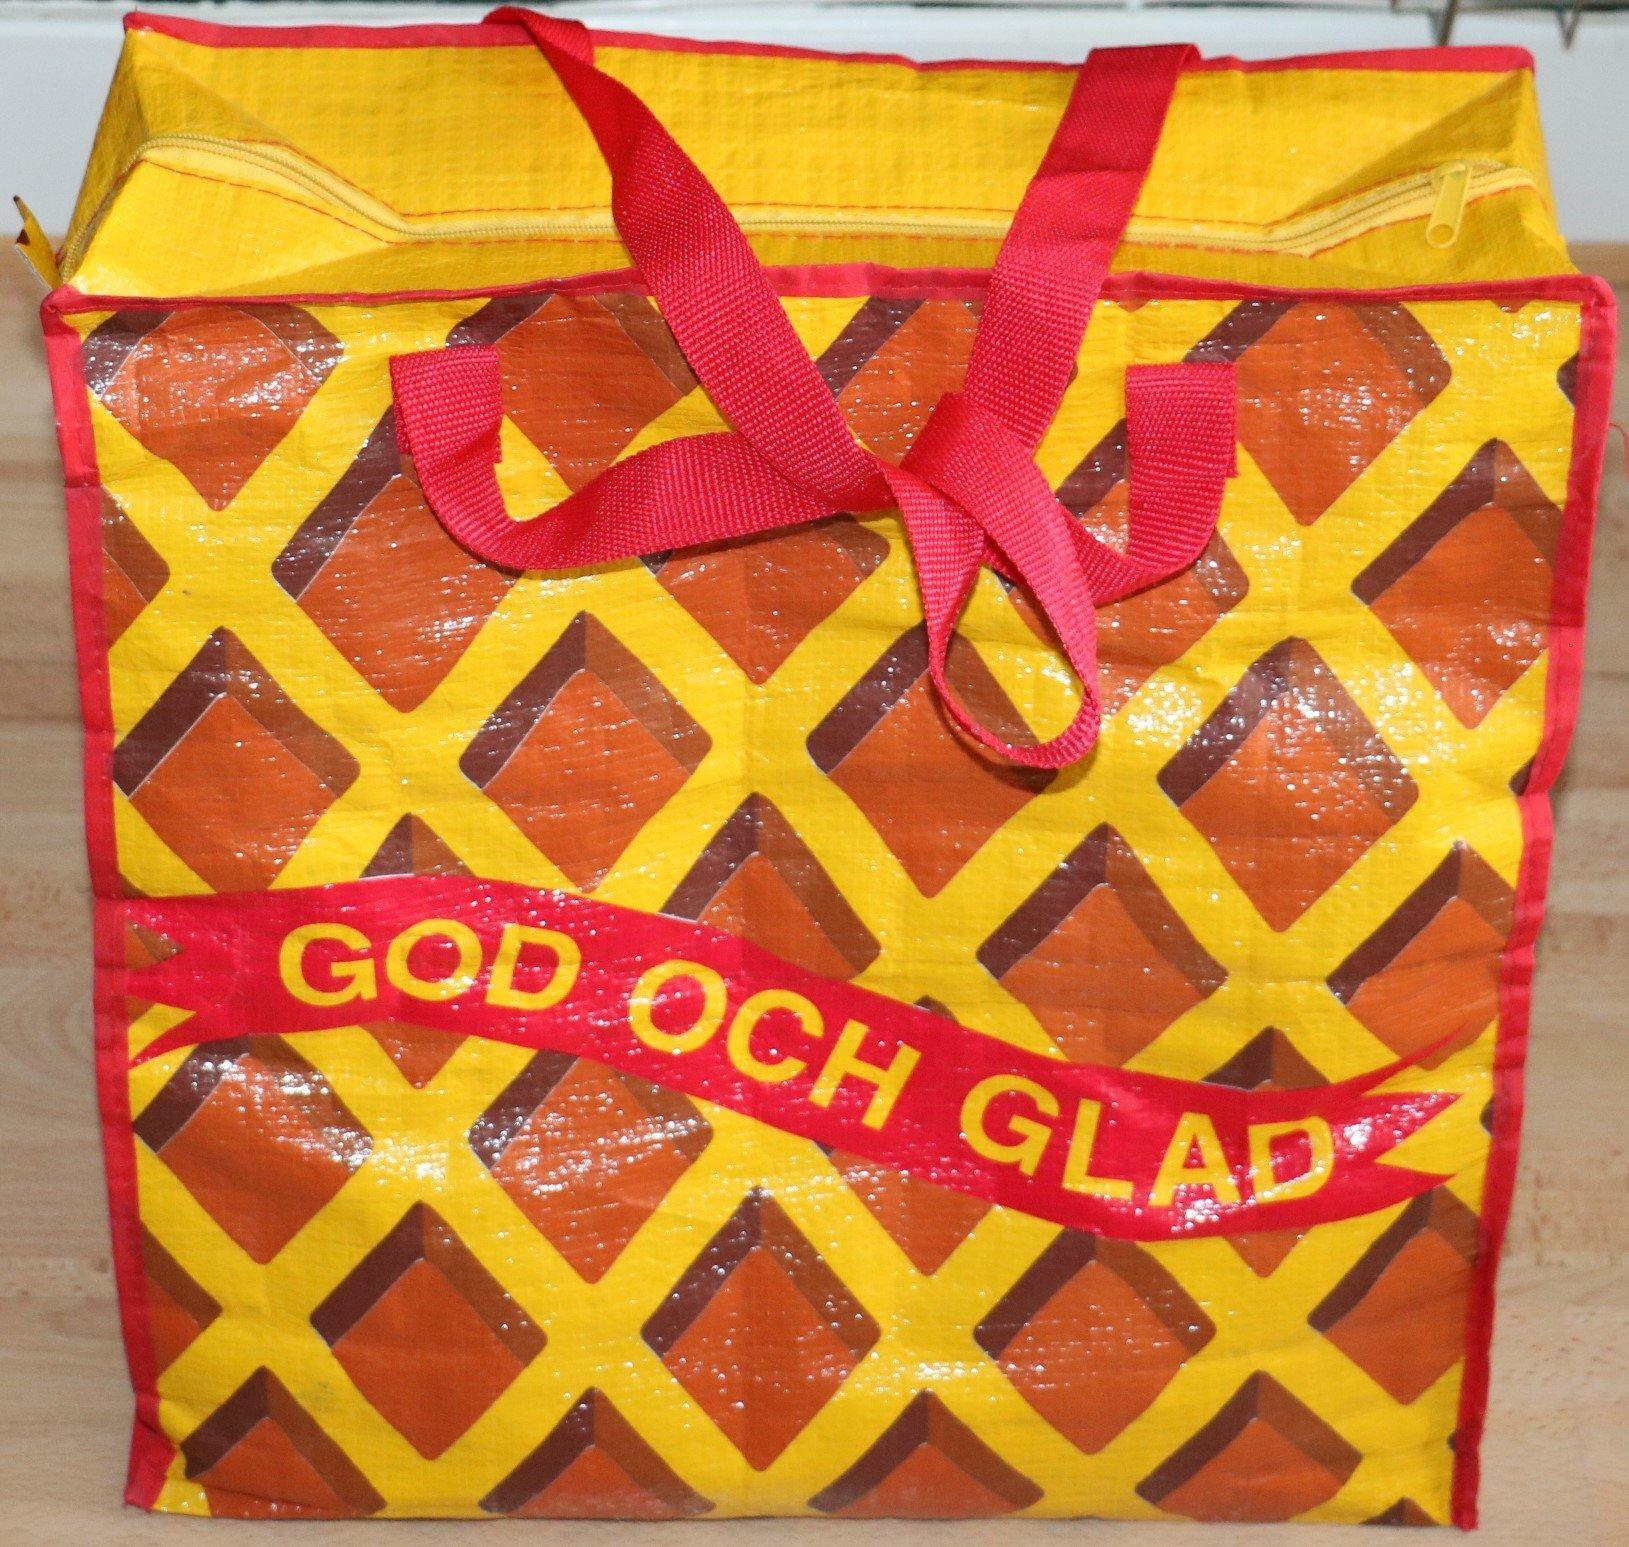 Reklam väskakasse Cloetta Kexchoklad 45 * 45 * 18 cm.